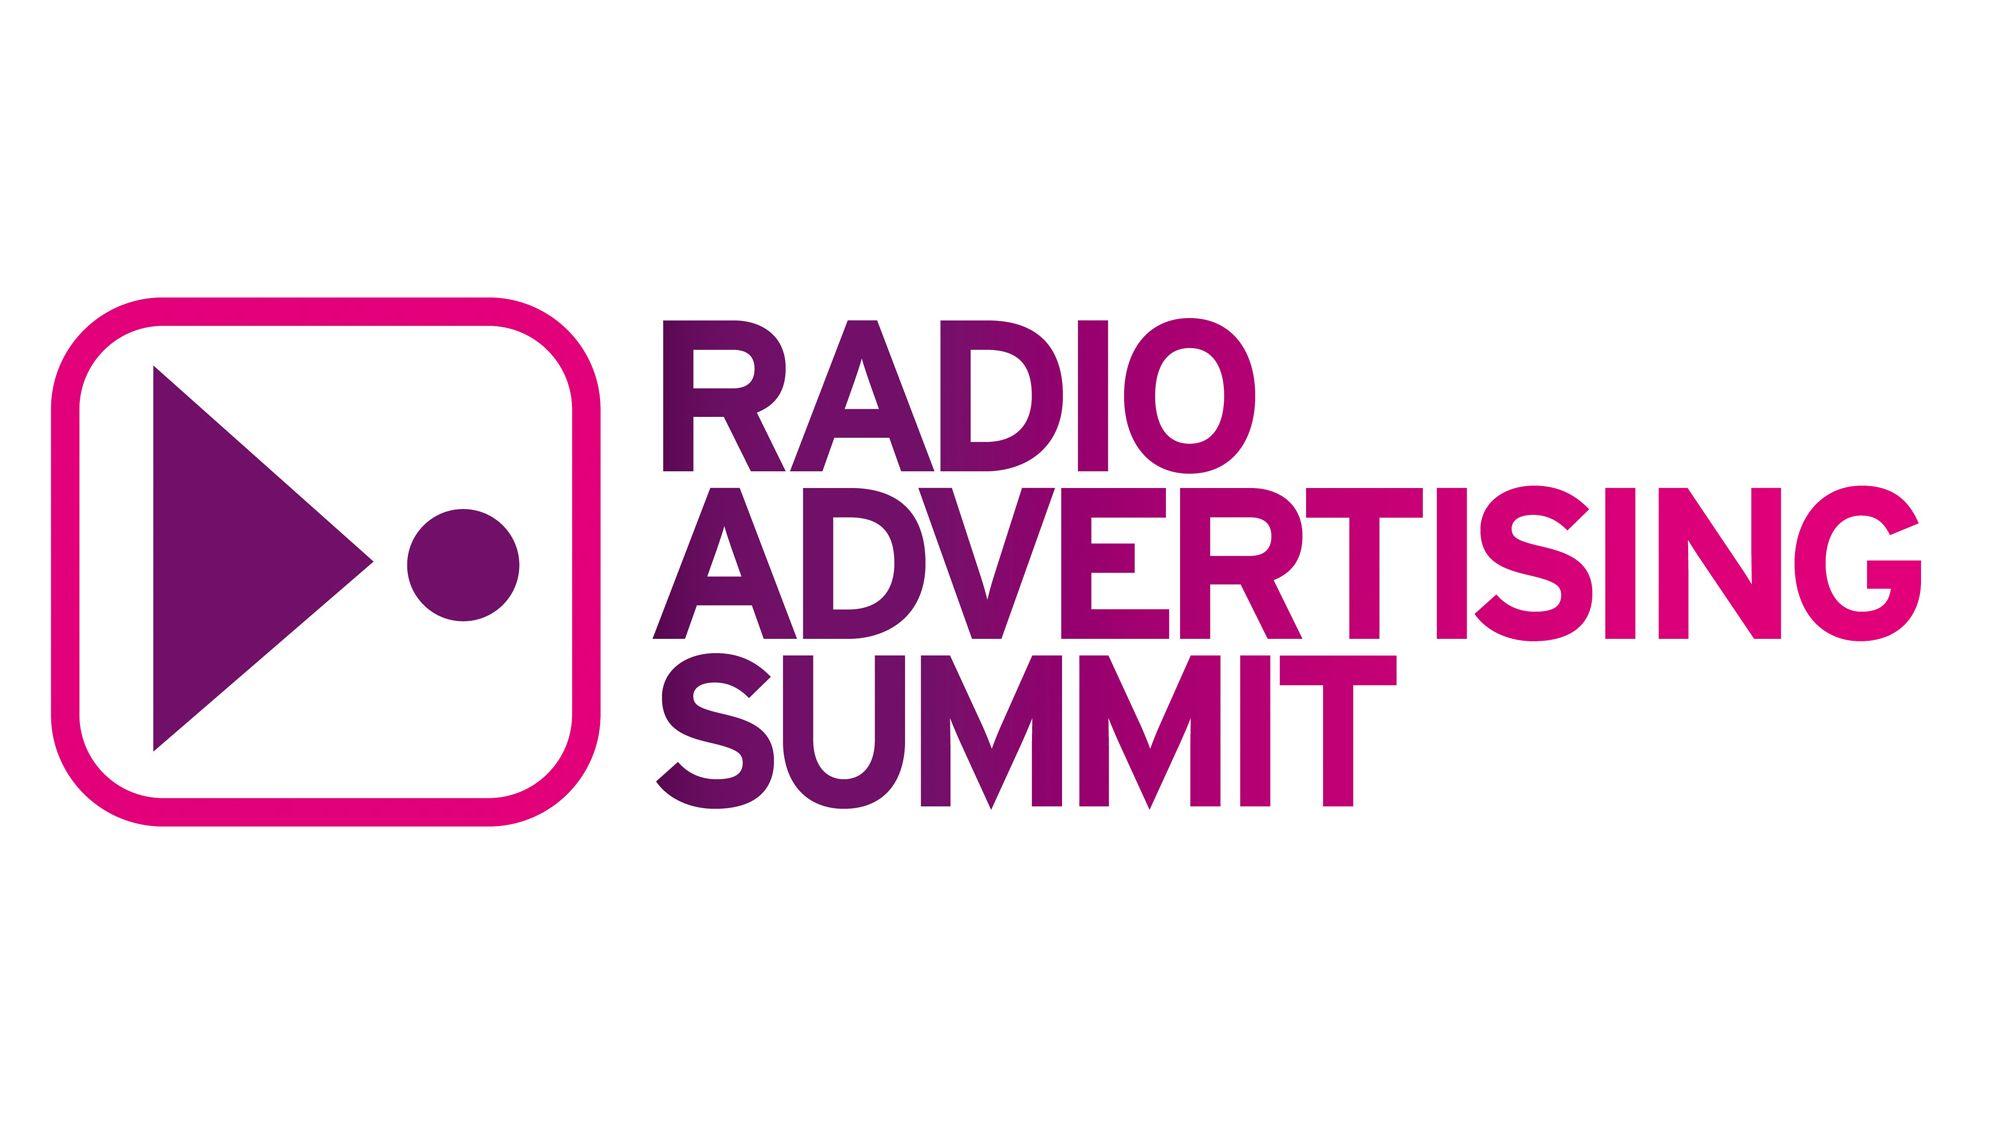 radio advertising summit unbewusst ins ohr. Black Bedroom Furniture Sets. Home Design Ideas